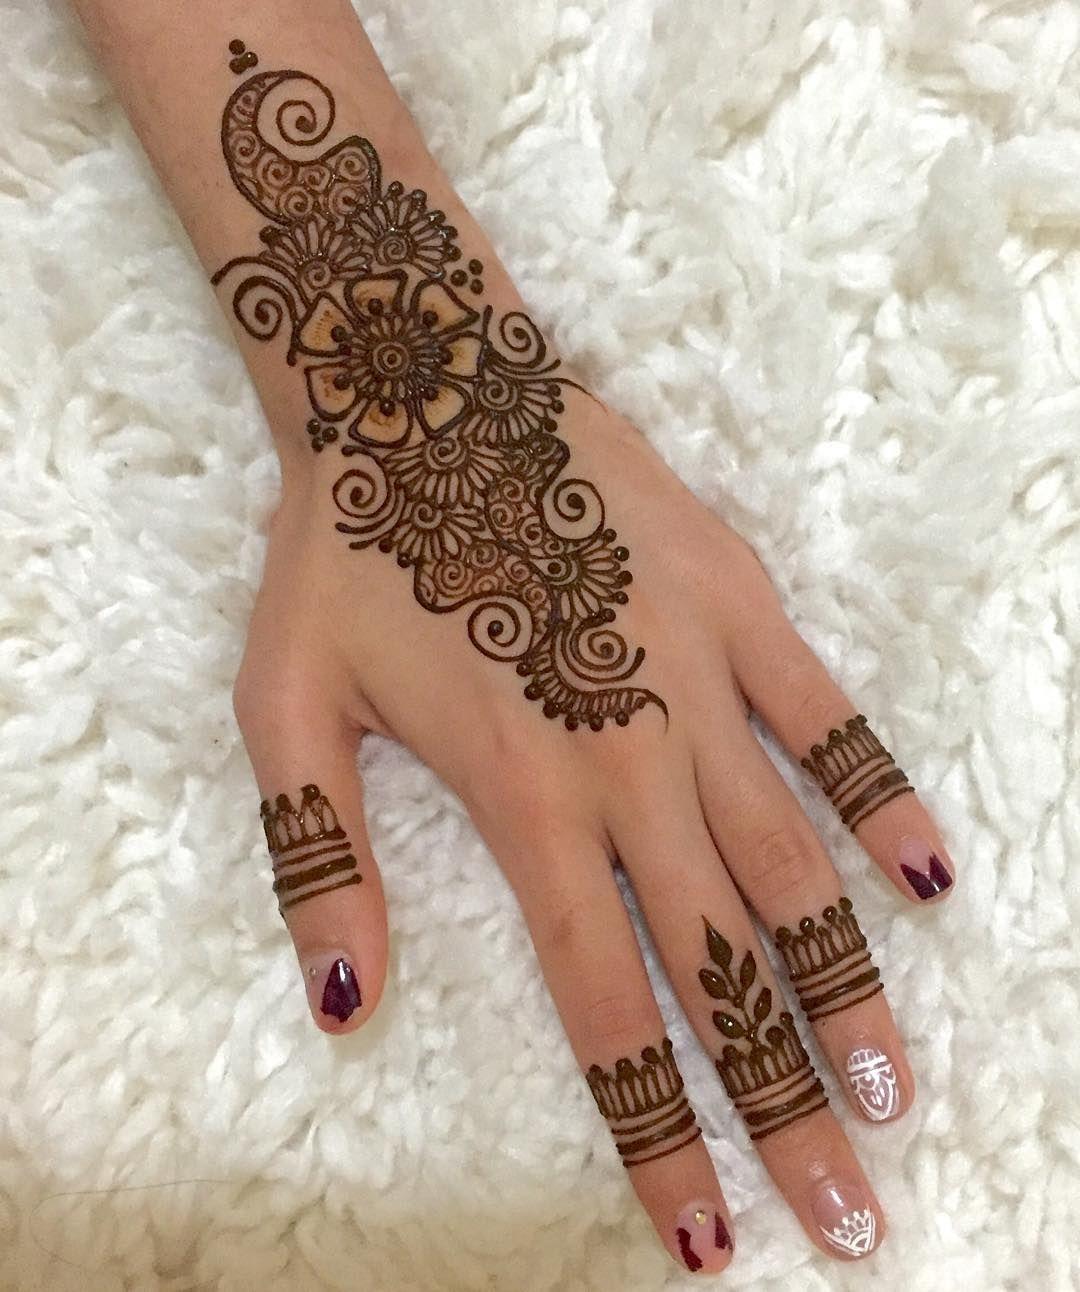 Pin de CasandraQCruz en Tatuaje Pie | Pinterest | Tatuajes, Henna y ...